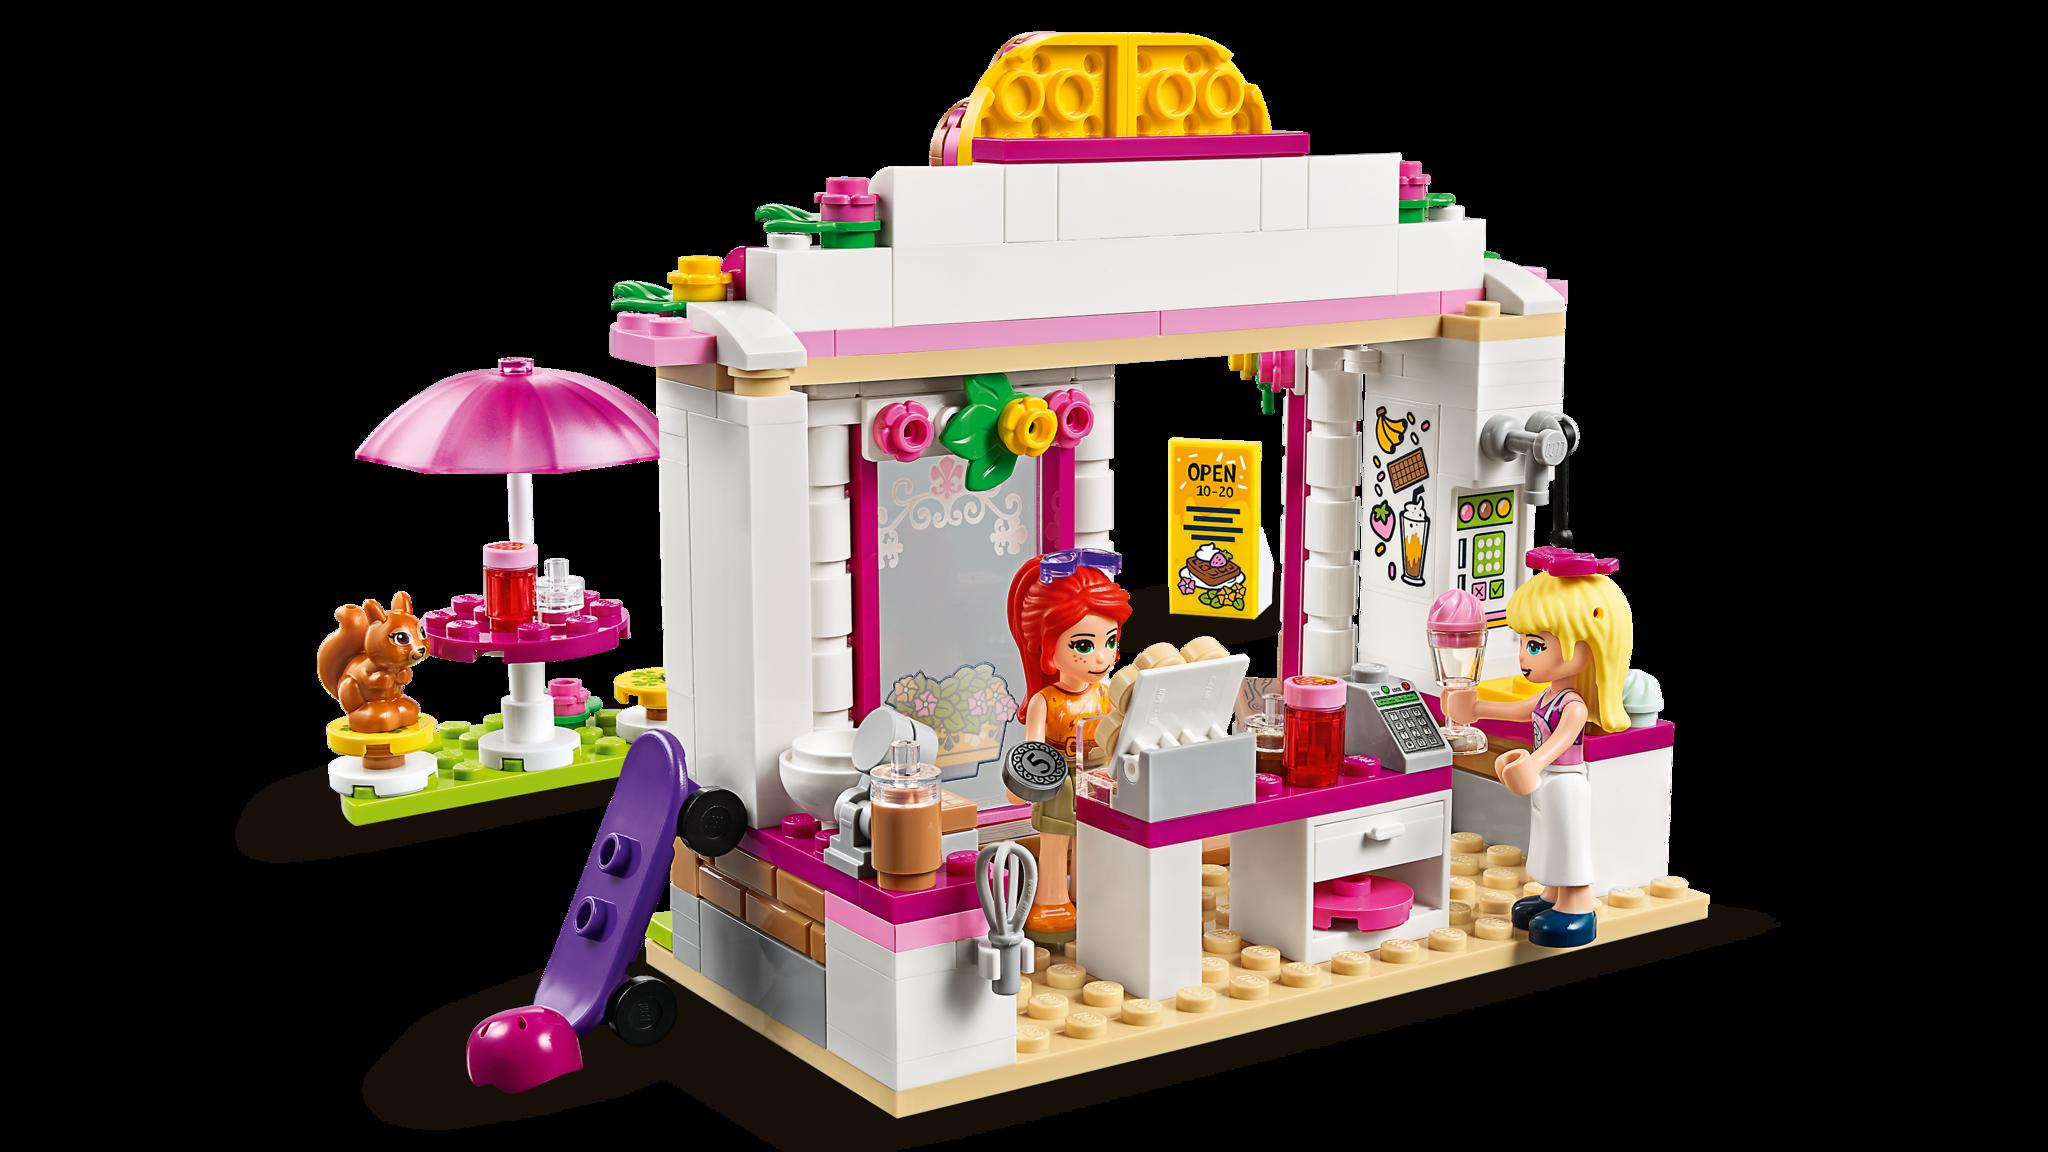 LEGO Friends 41426 Конструктор ЛЕГО Подружки Кафе в парке Хартлейк Сити